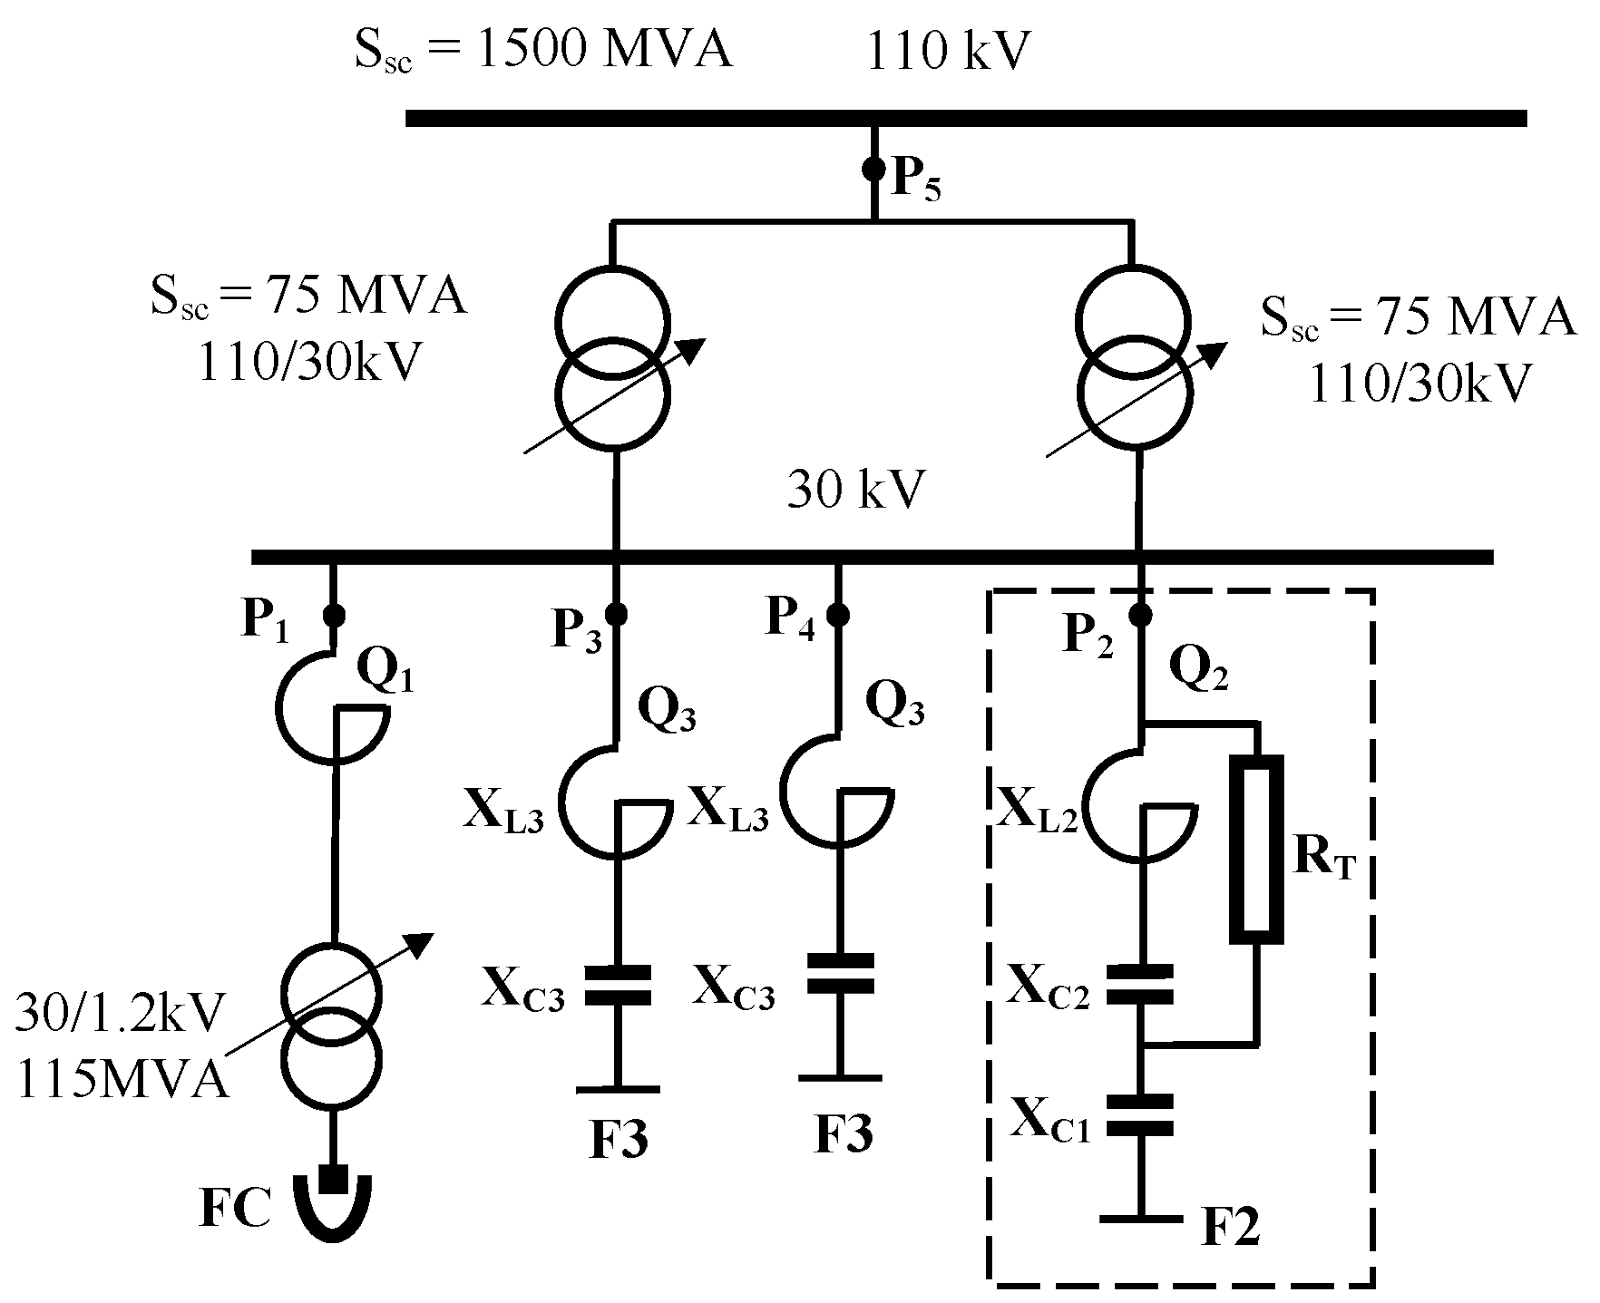 Square D 480v Transformer Wiring Diagram Origami Unicorn Notation New Era Of